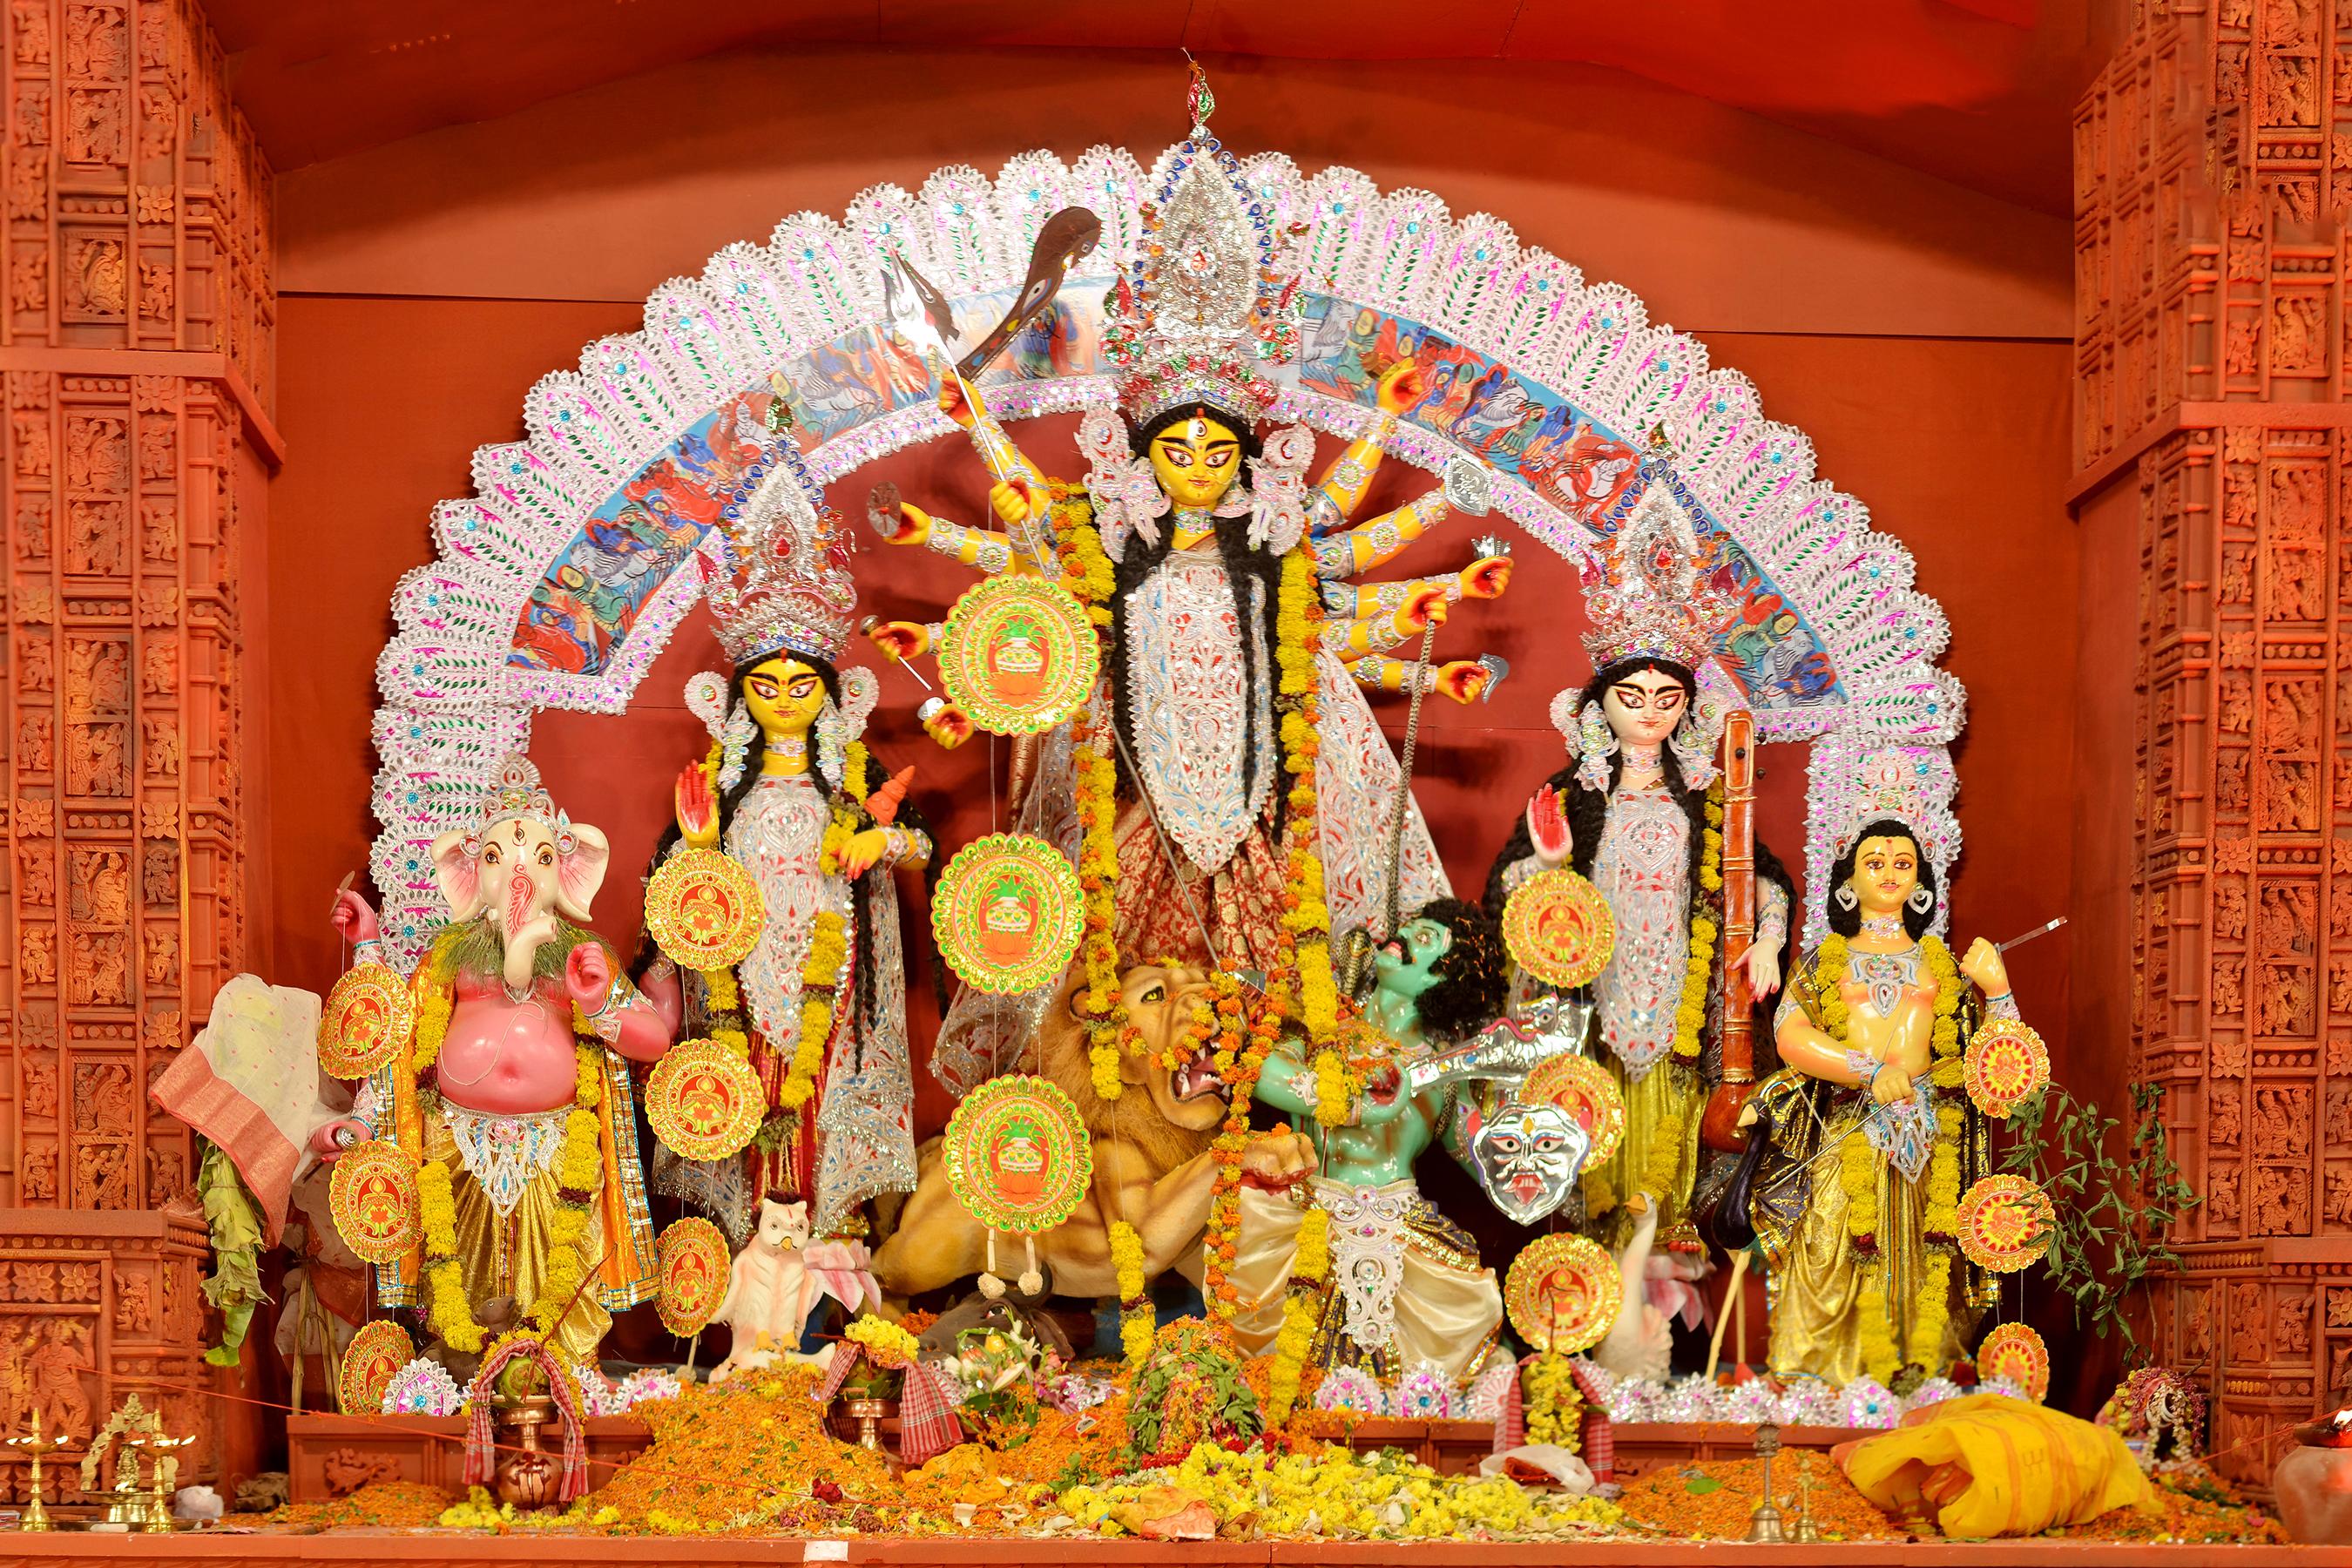 Committes brainstorm over Drive in darshan this Durga Puja in Kolkata